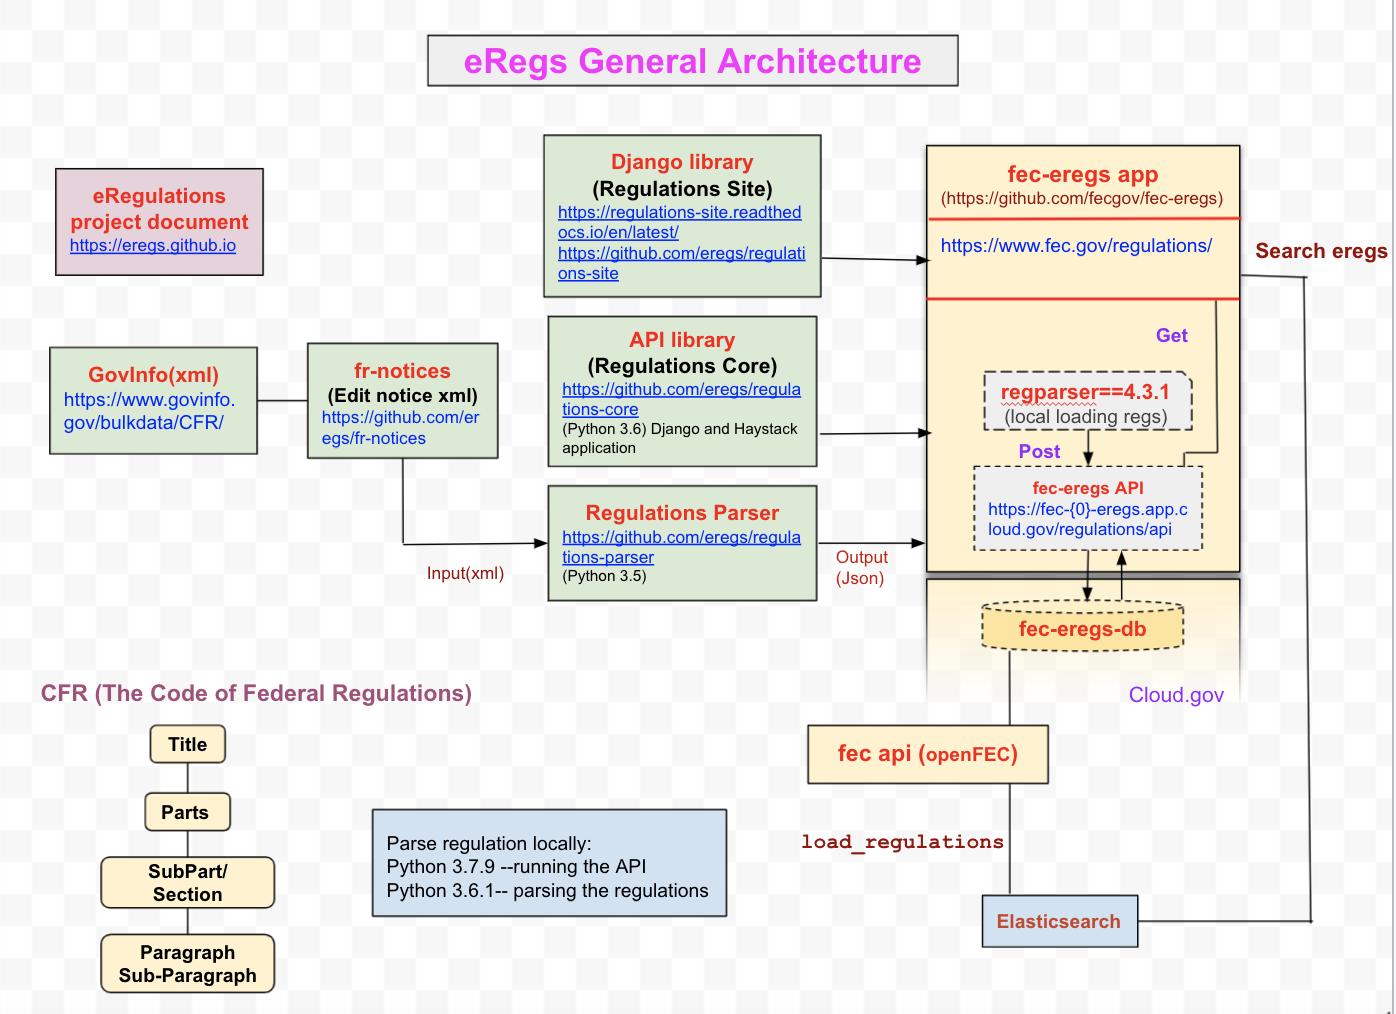 General Architecture (described below)